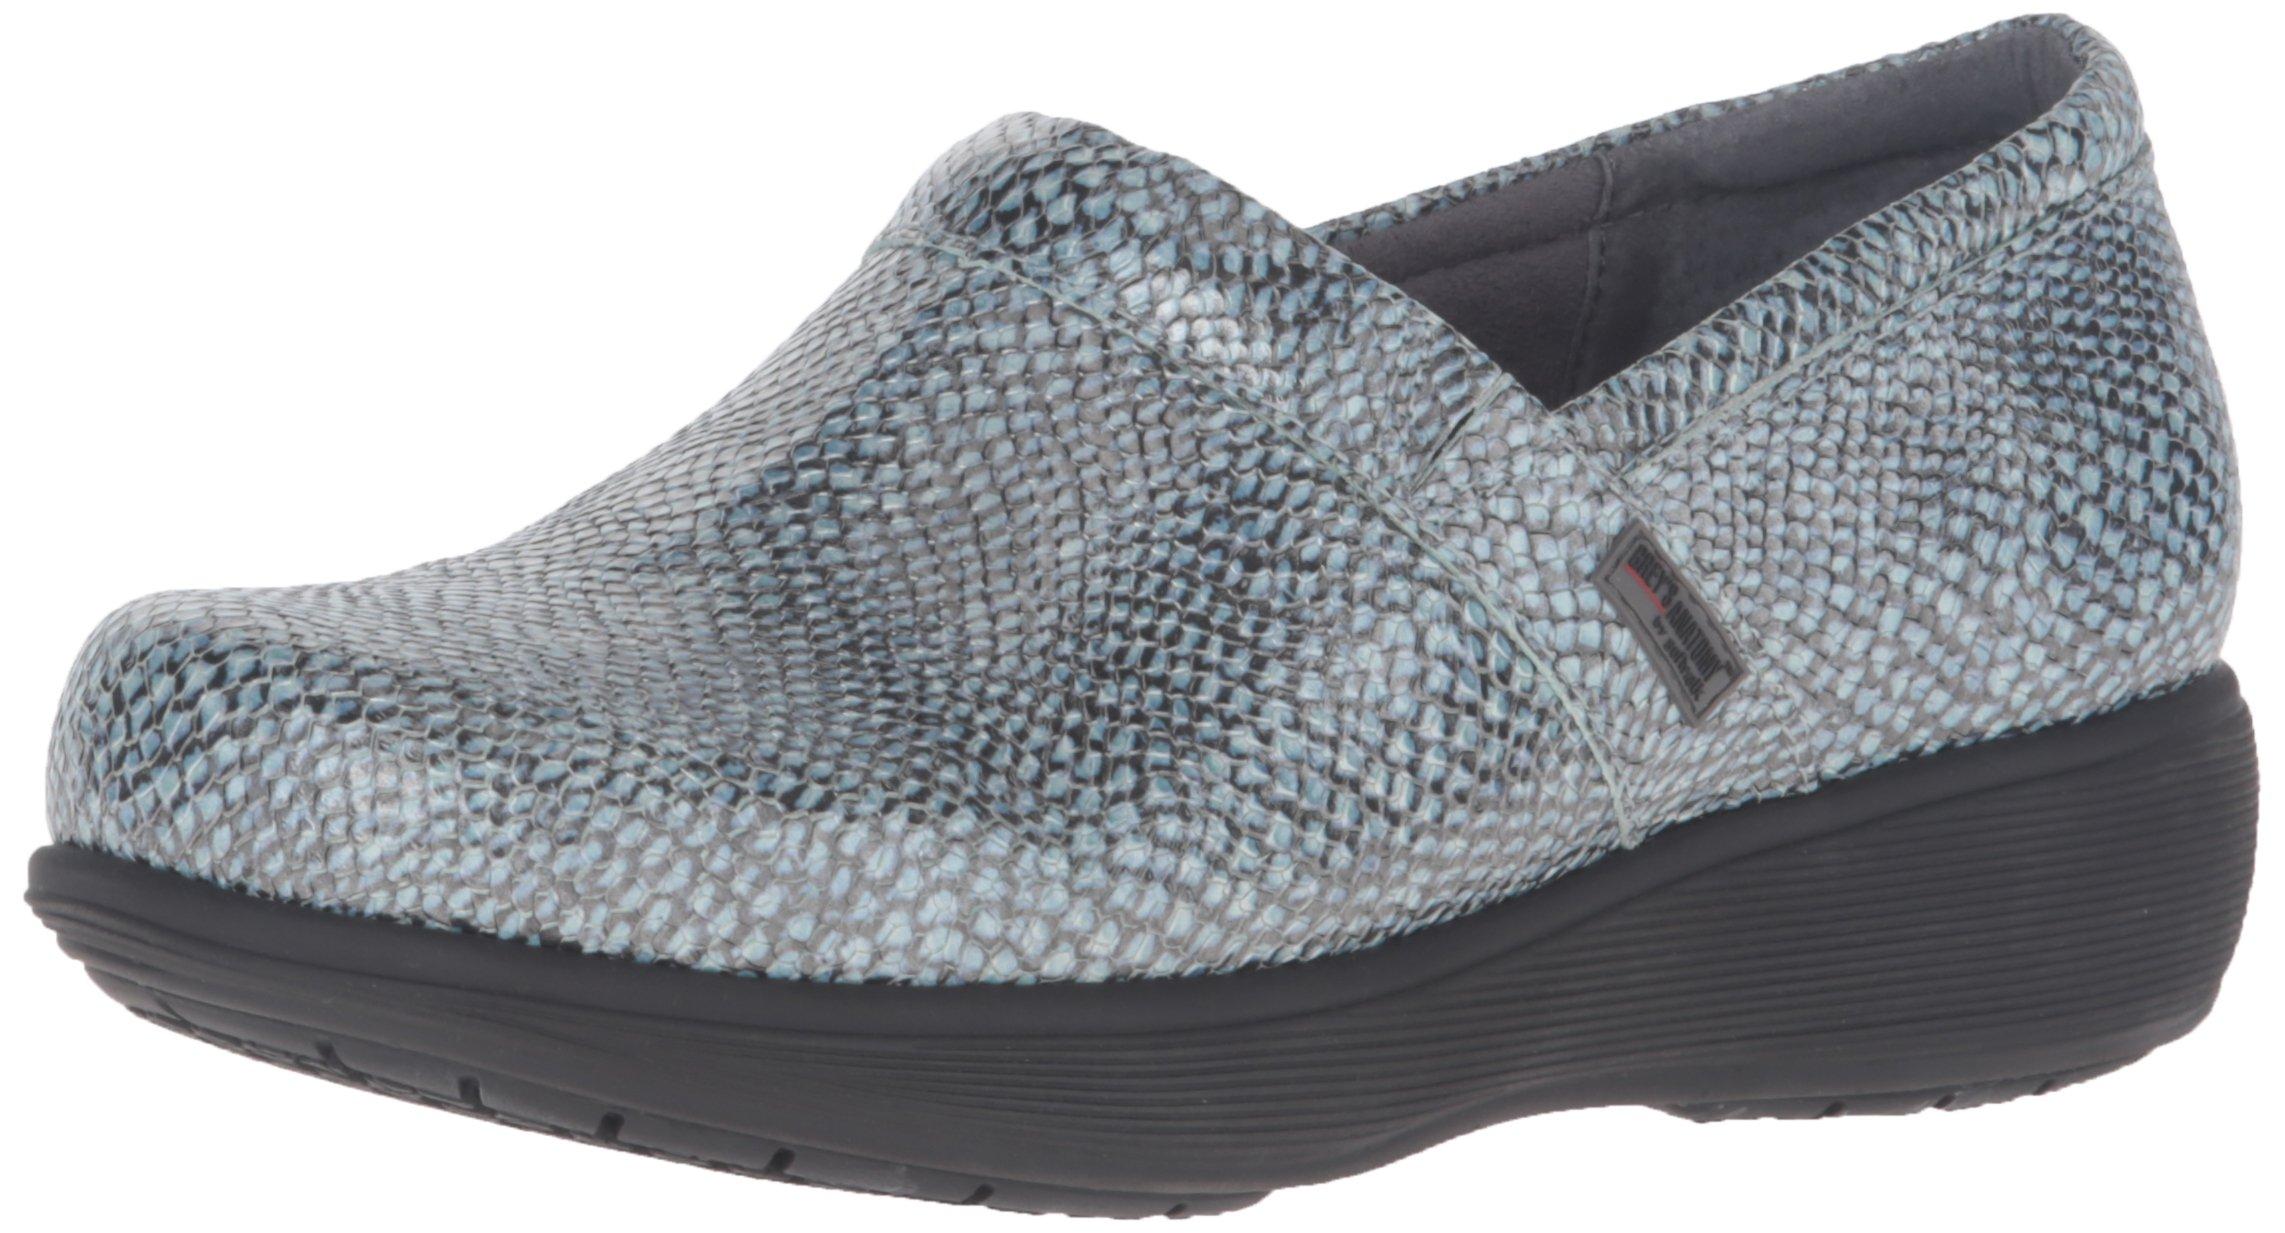 Softwalk Women's Meredith Shoe, blue snake, 8.0 M US